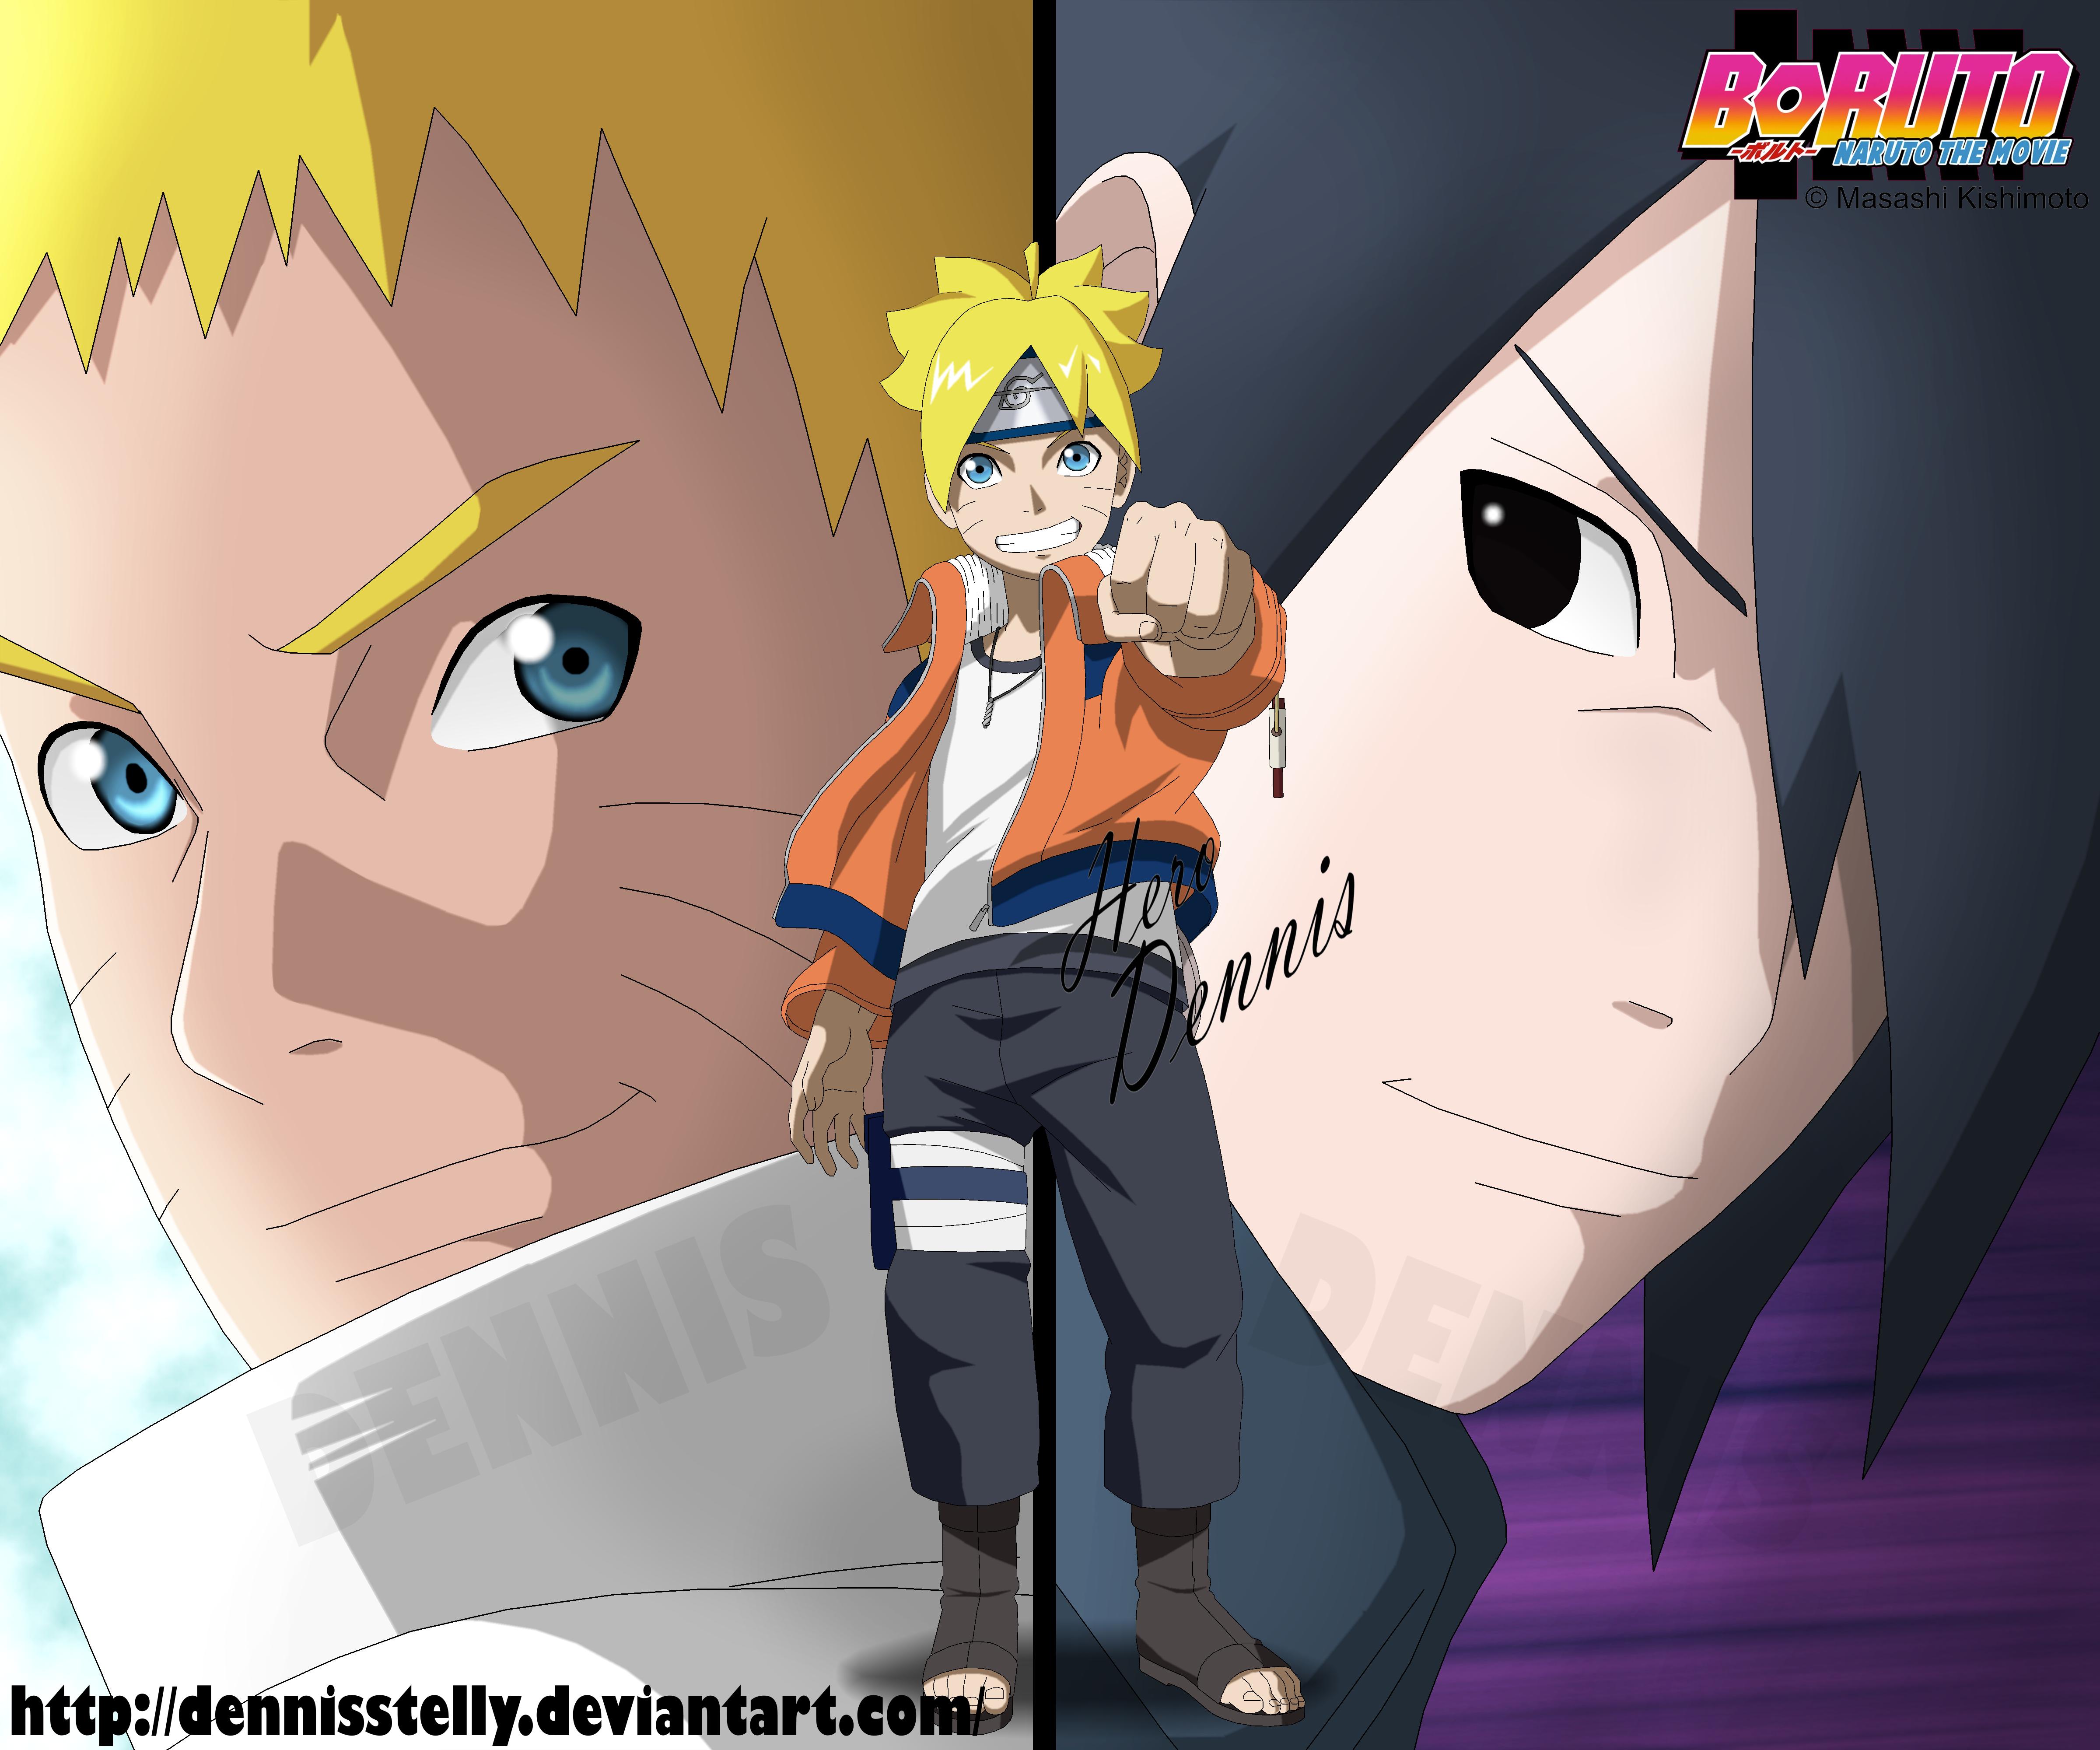 Popular Wallpaper Naruto Boruto - boruto___naruto_the_movie___cover_by_dennisstelly-d8zc6zx  HD_892913.png